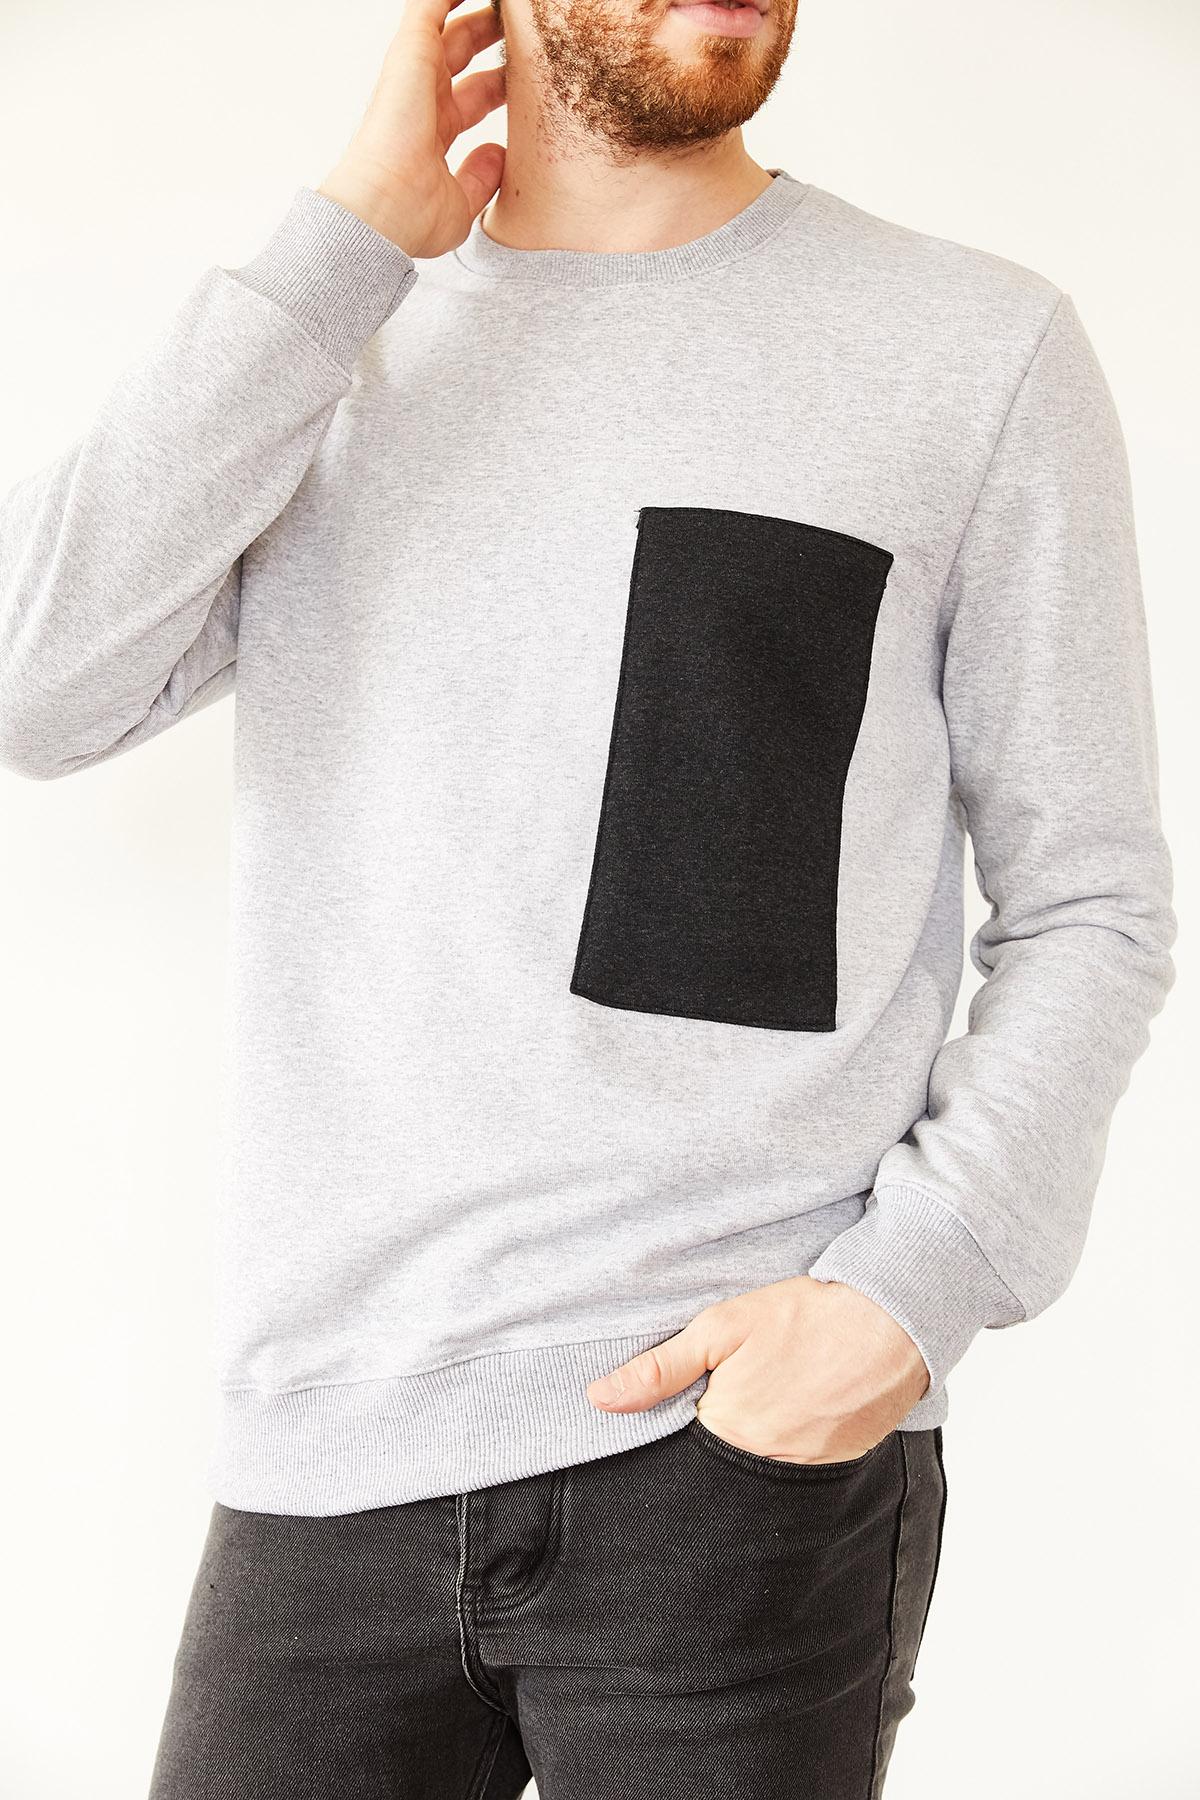 - Gri Göğüs Detaylı Üç İplik Sweatshirt 1KXE8-44132-03